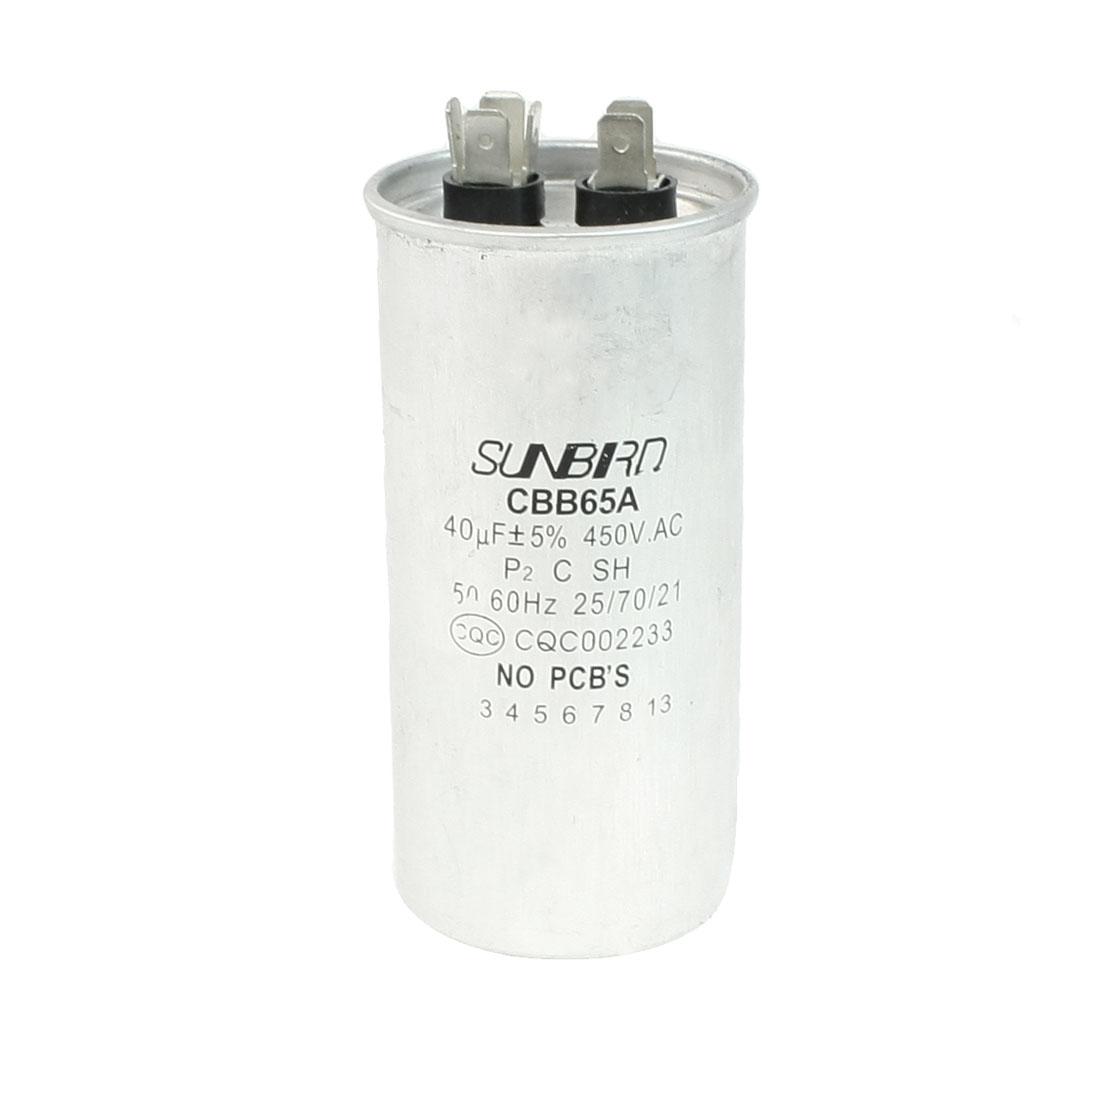 450VAC 40uF Capacity Cylinder Shaped Refrigerator Motor Capacitor CBB65A